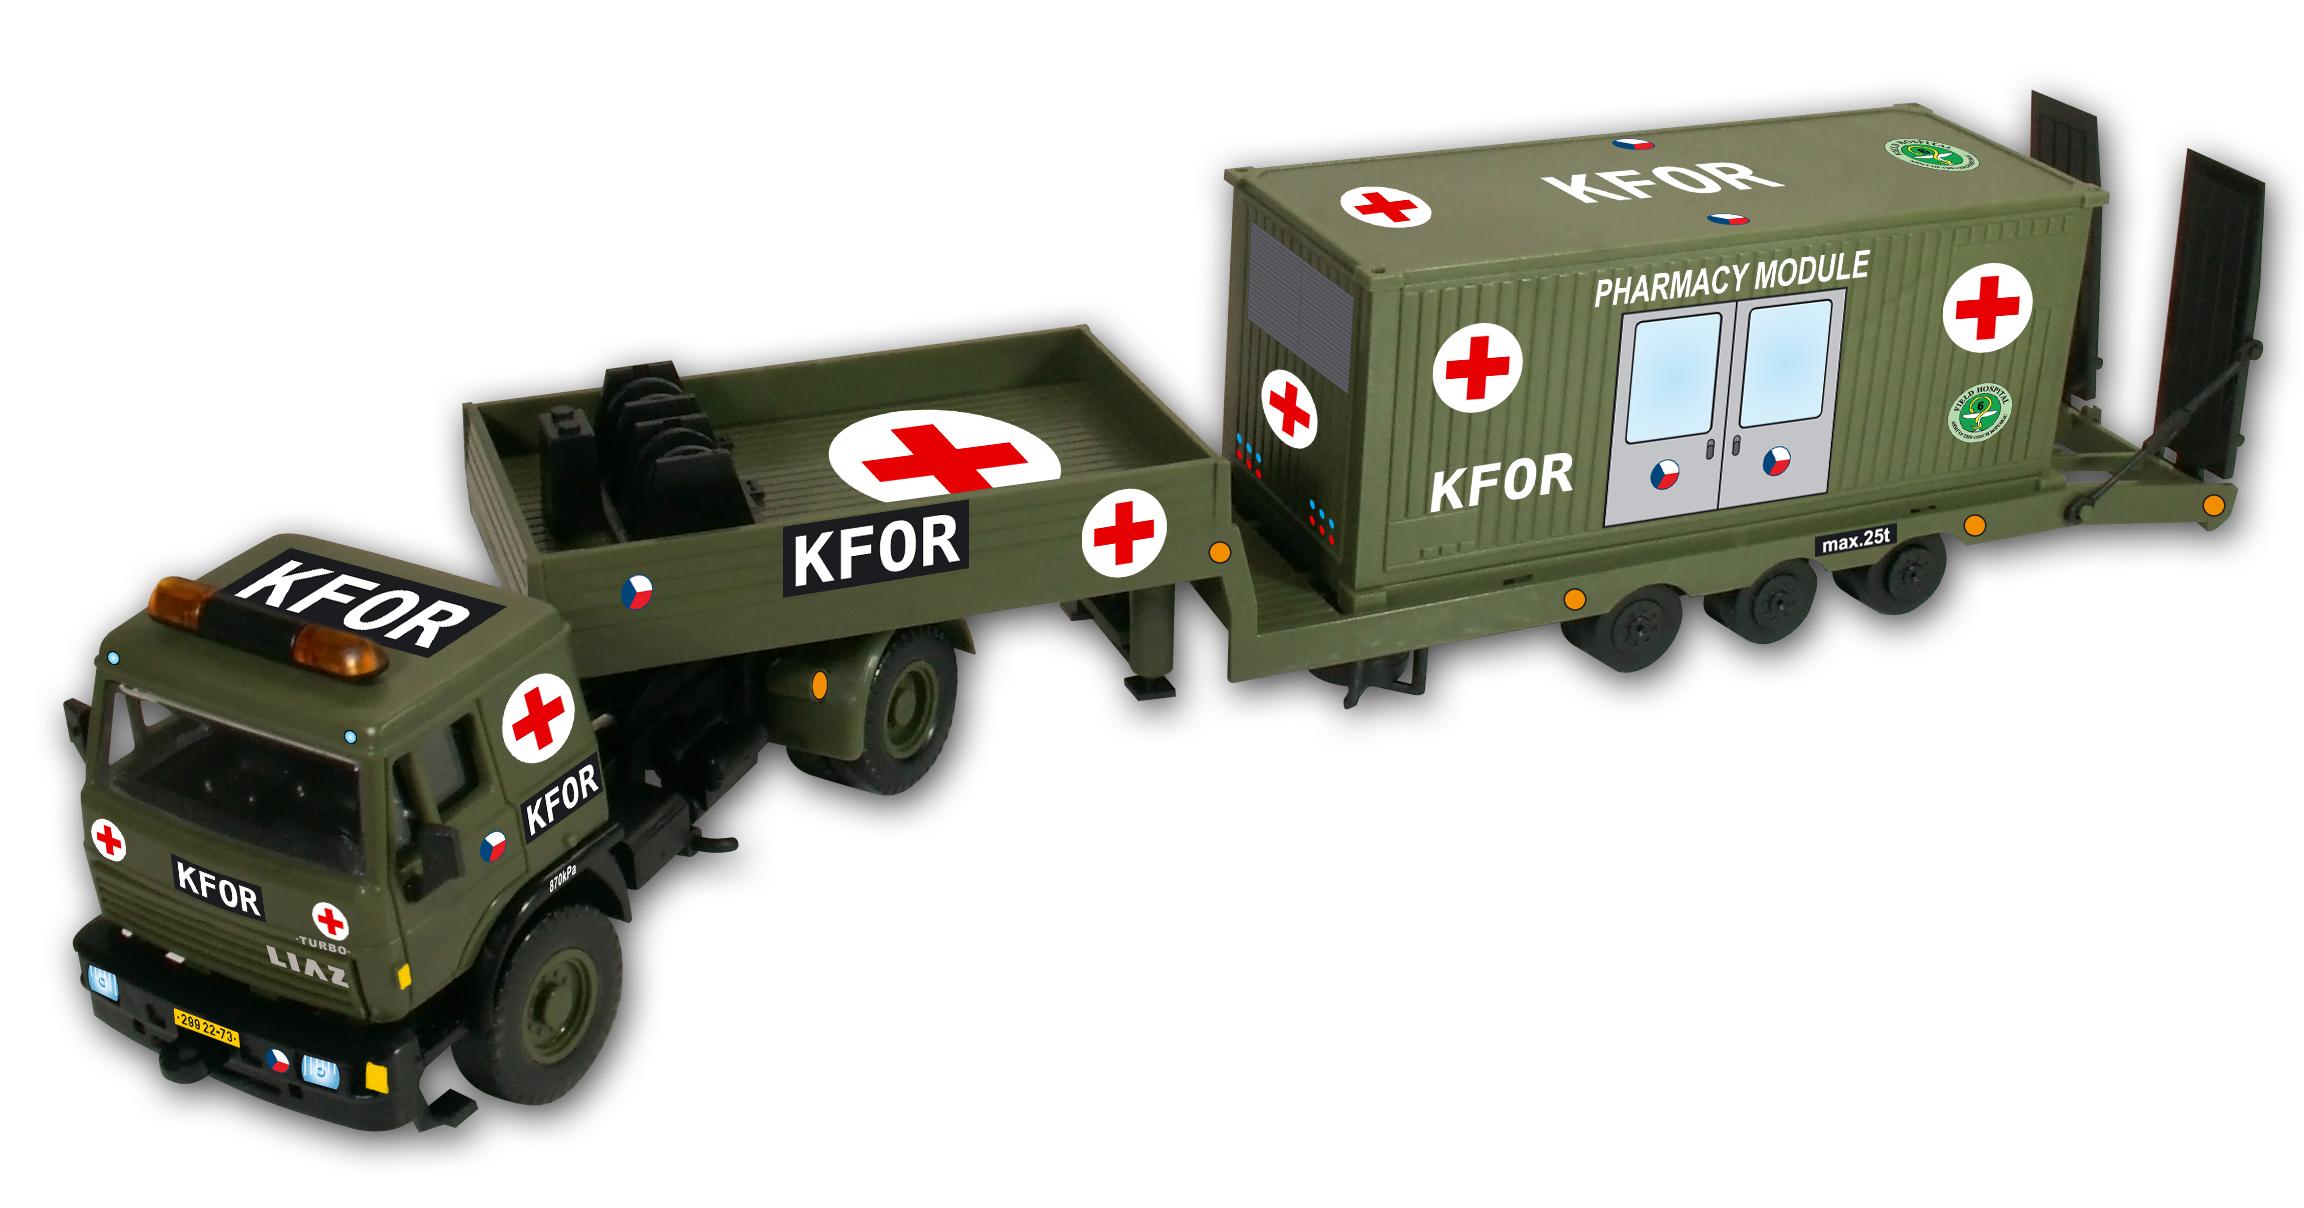 Liaz KFOR Medical